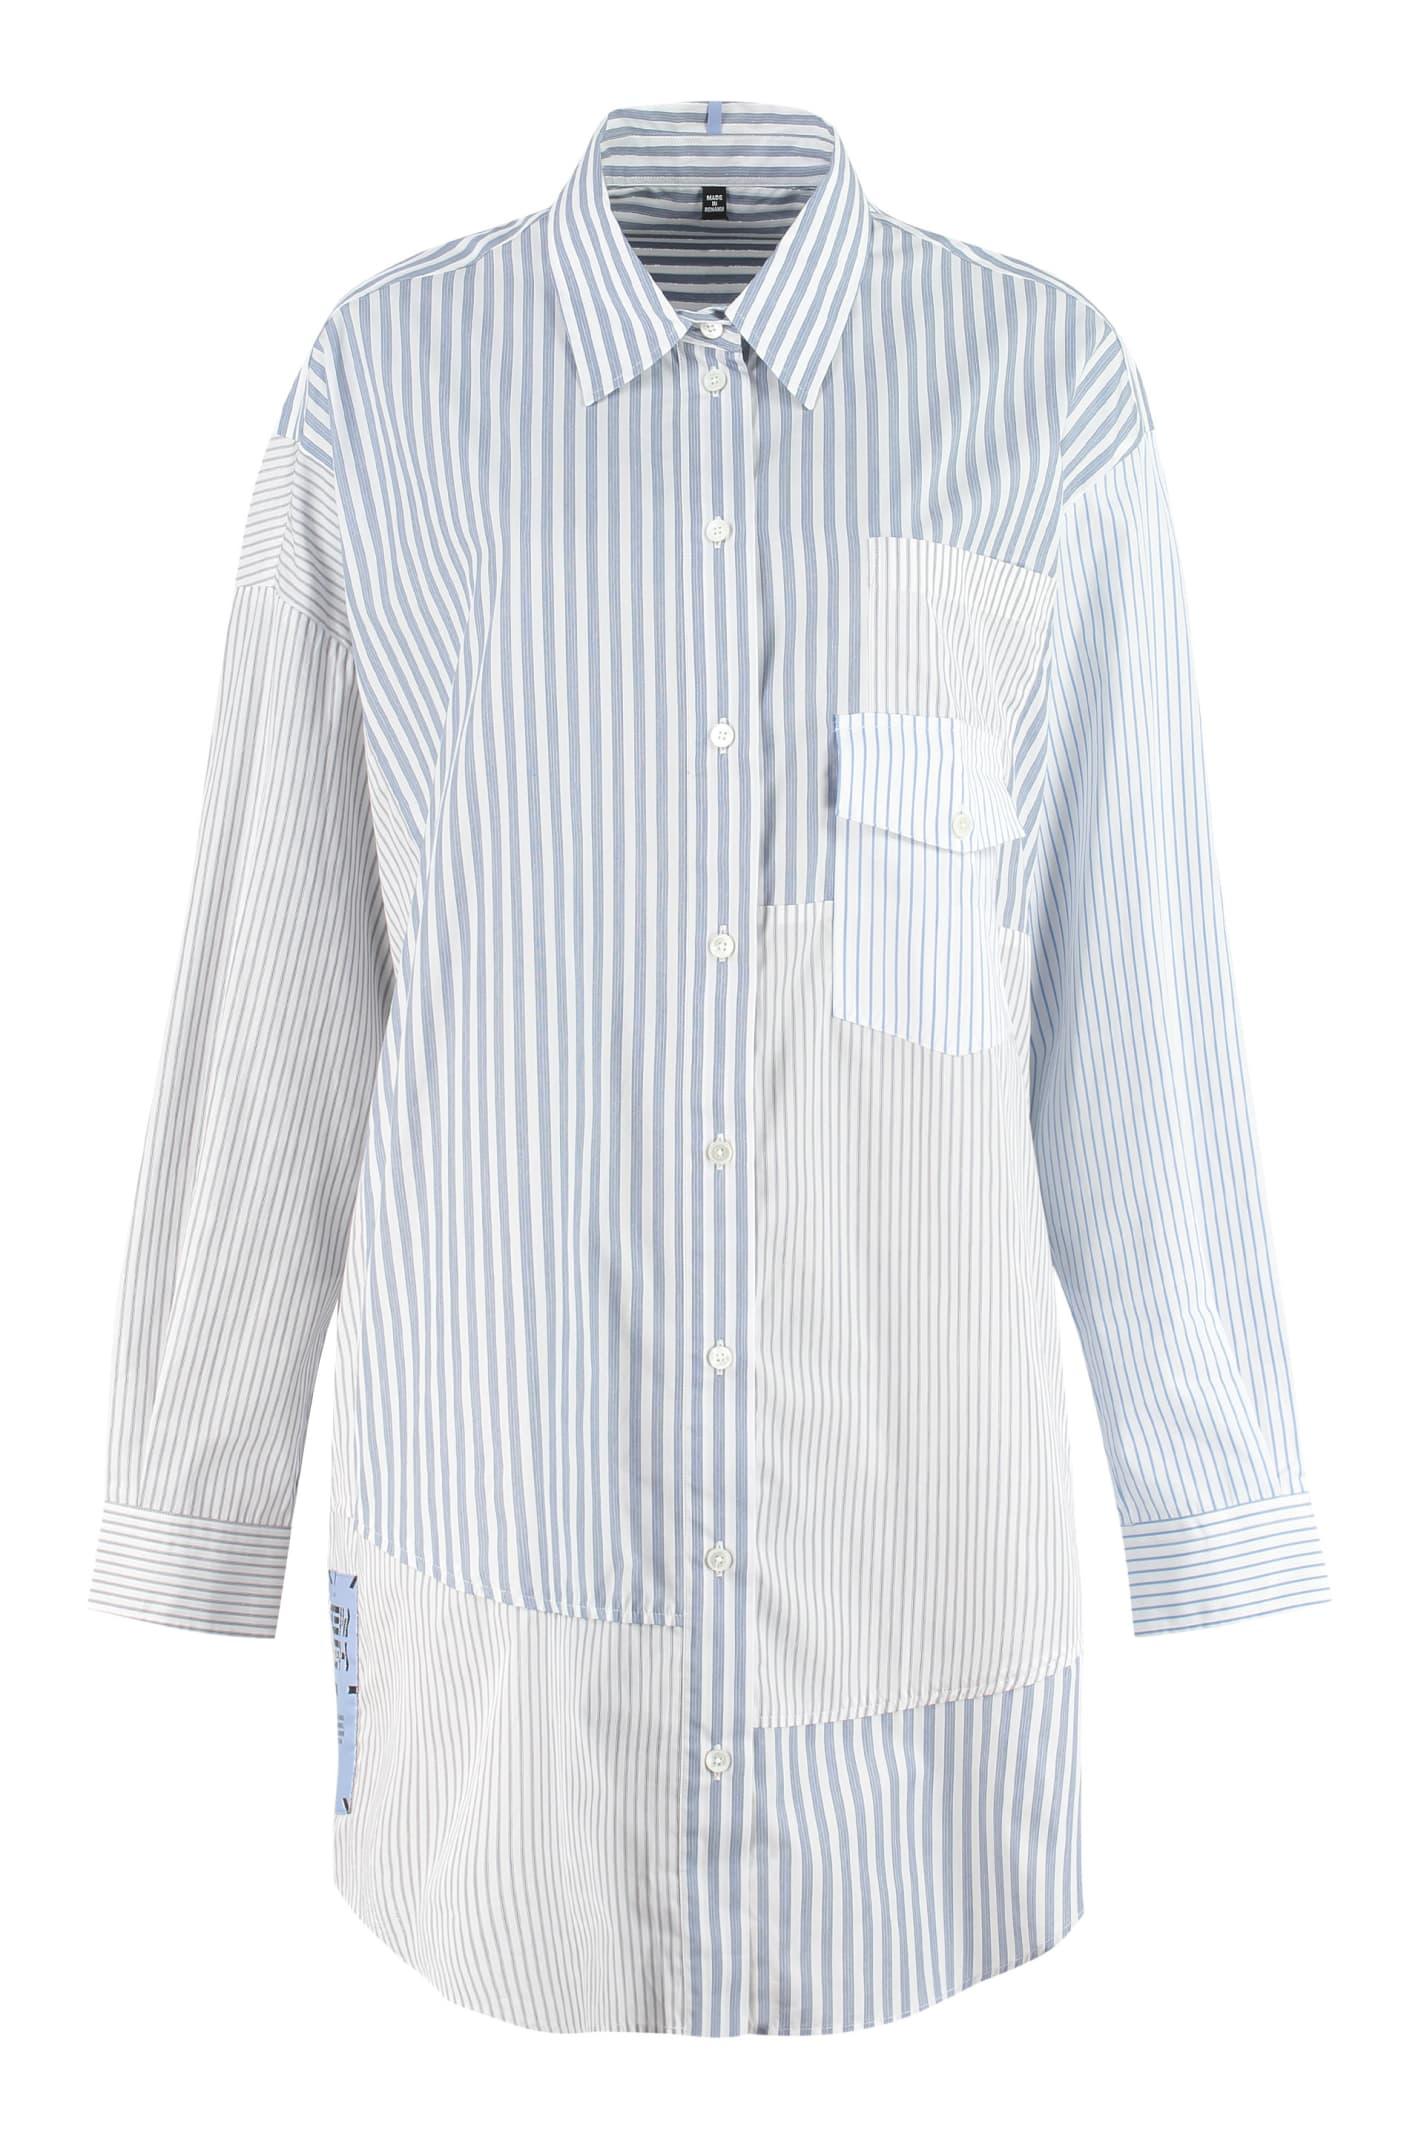 Buy McQ Alexander McQueen Striped Cotton Shirtdress online, shop McQ Alexander McQueen with free shipping